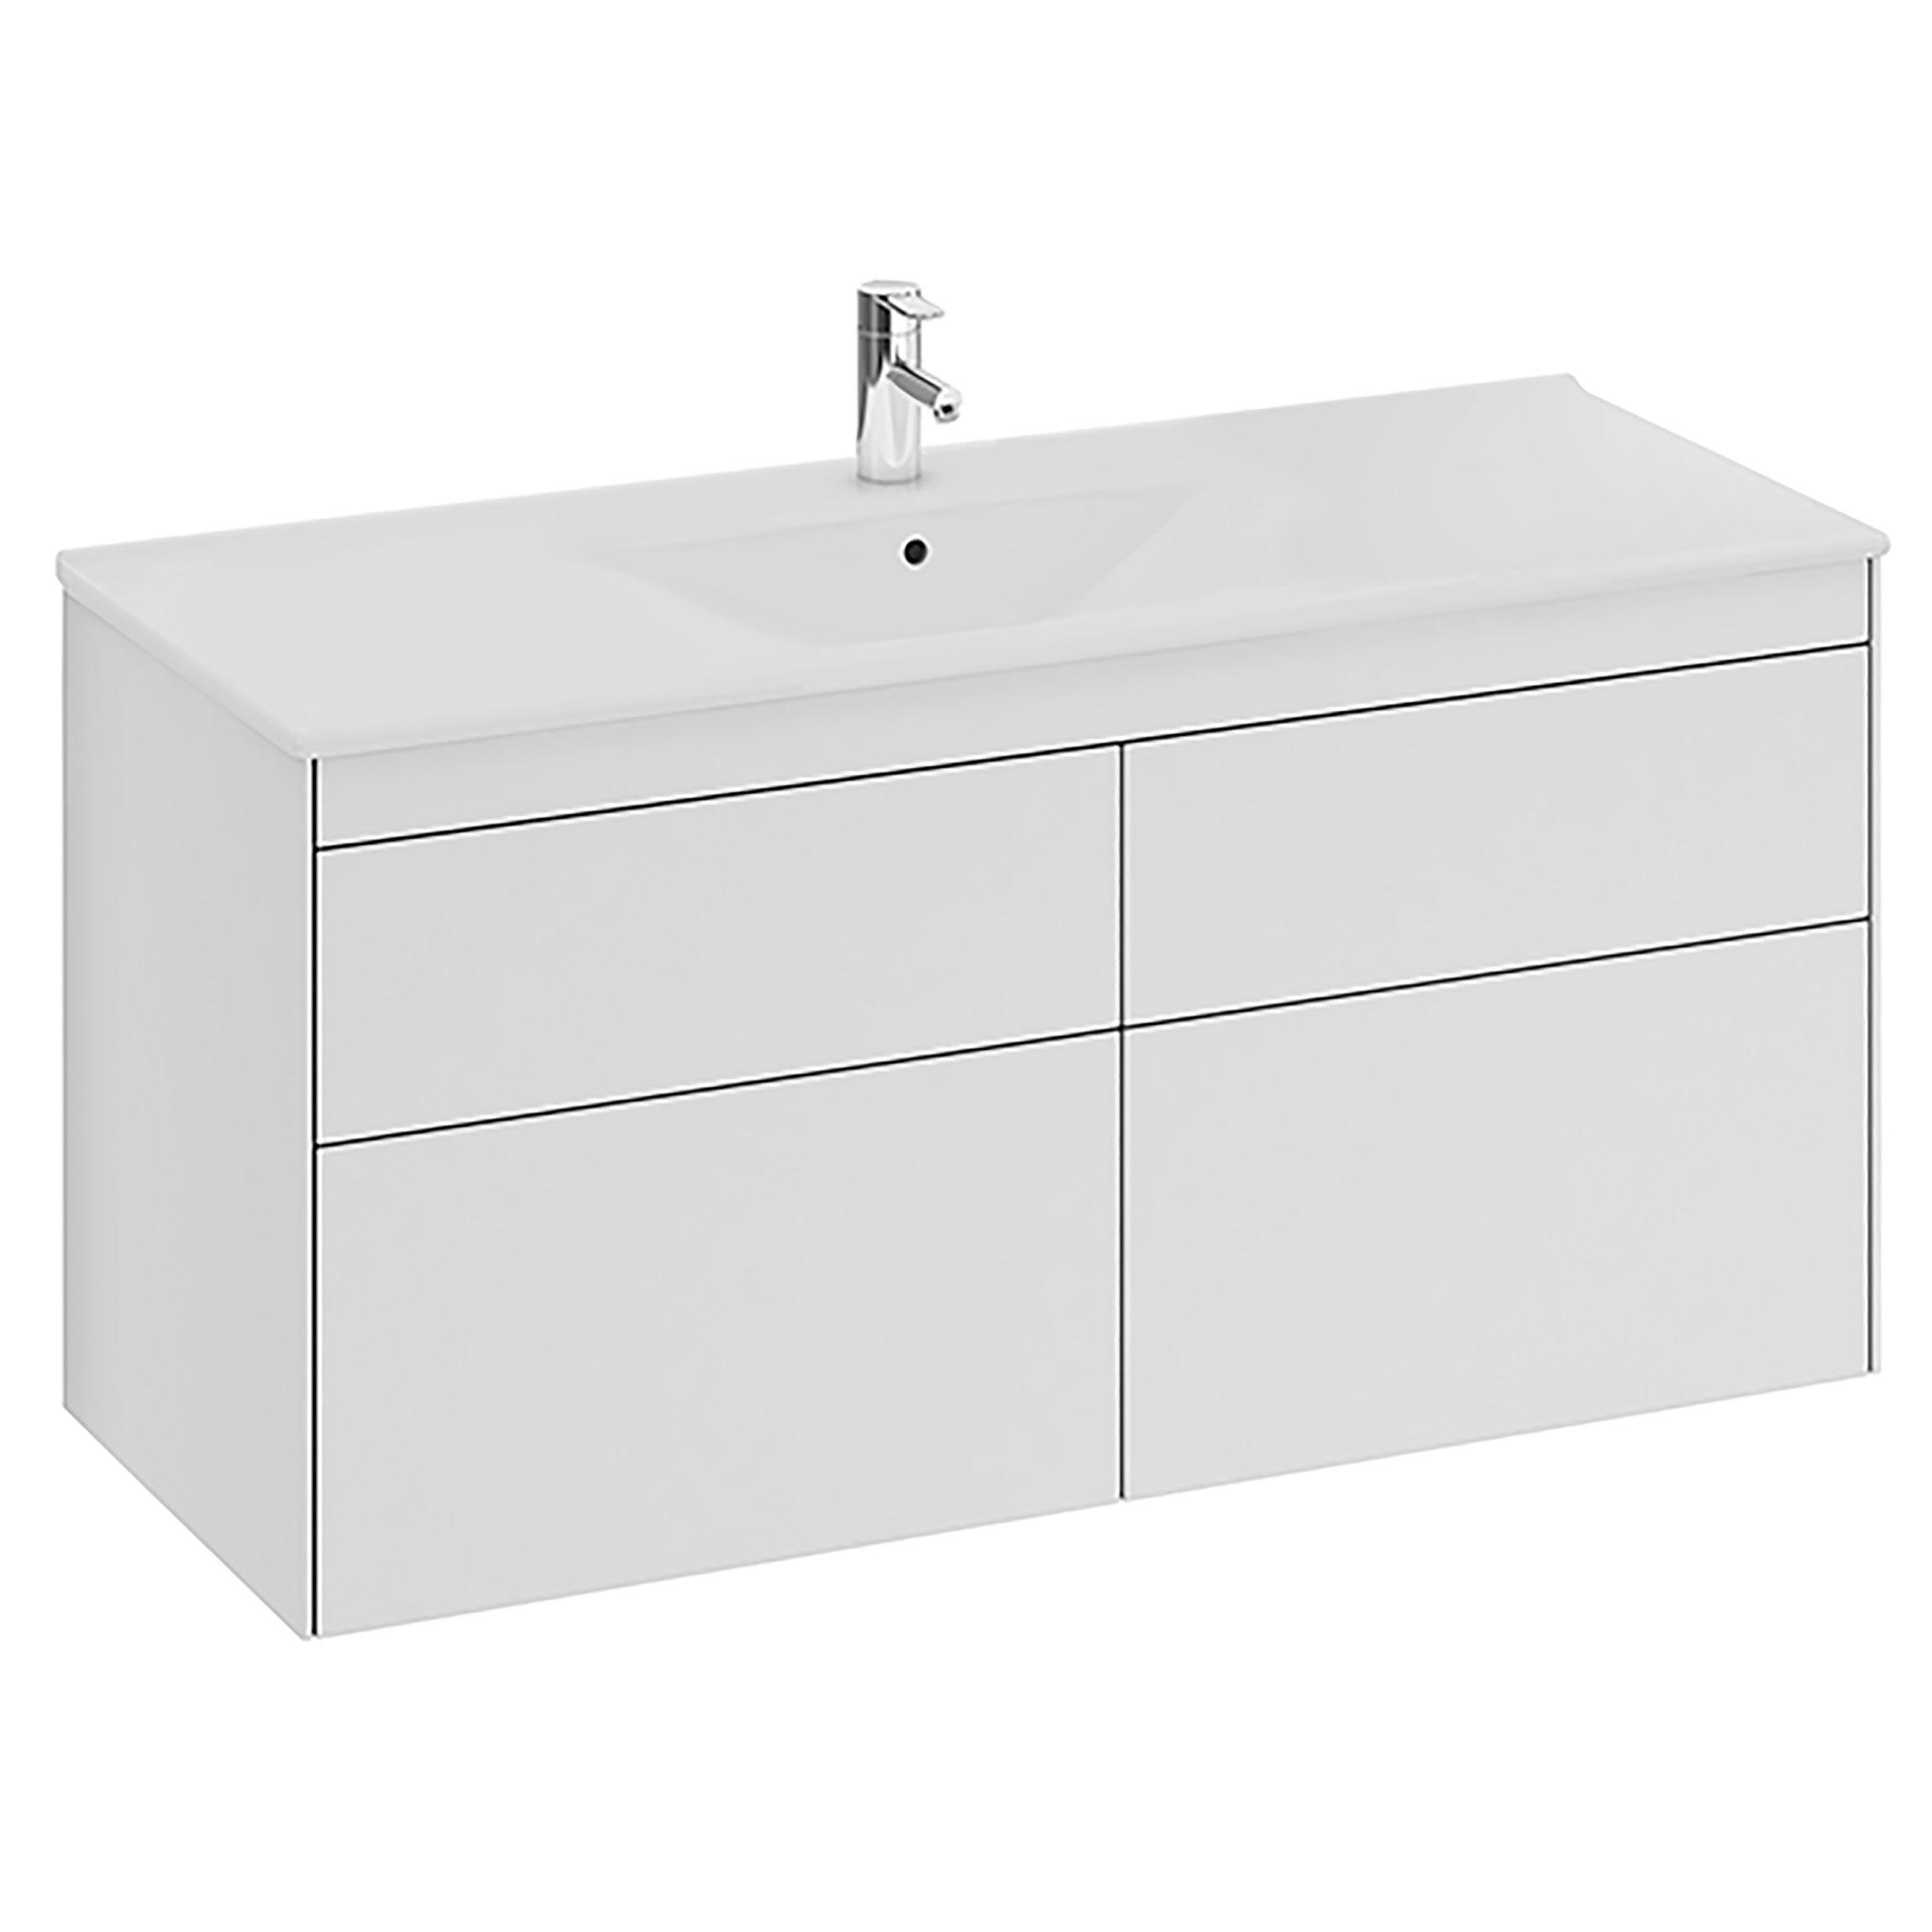 Tvättställsskåp Ifö Sense 120